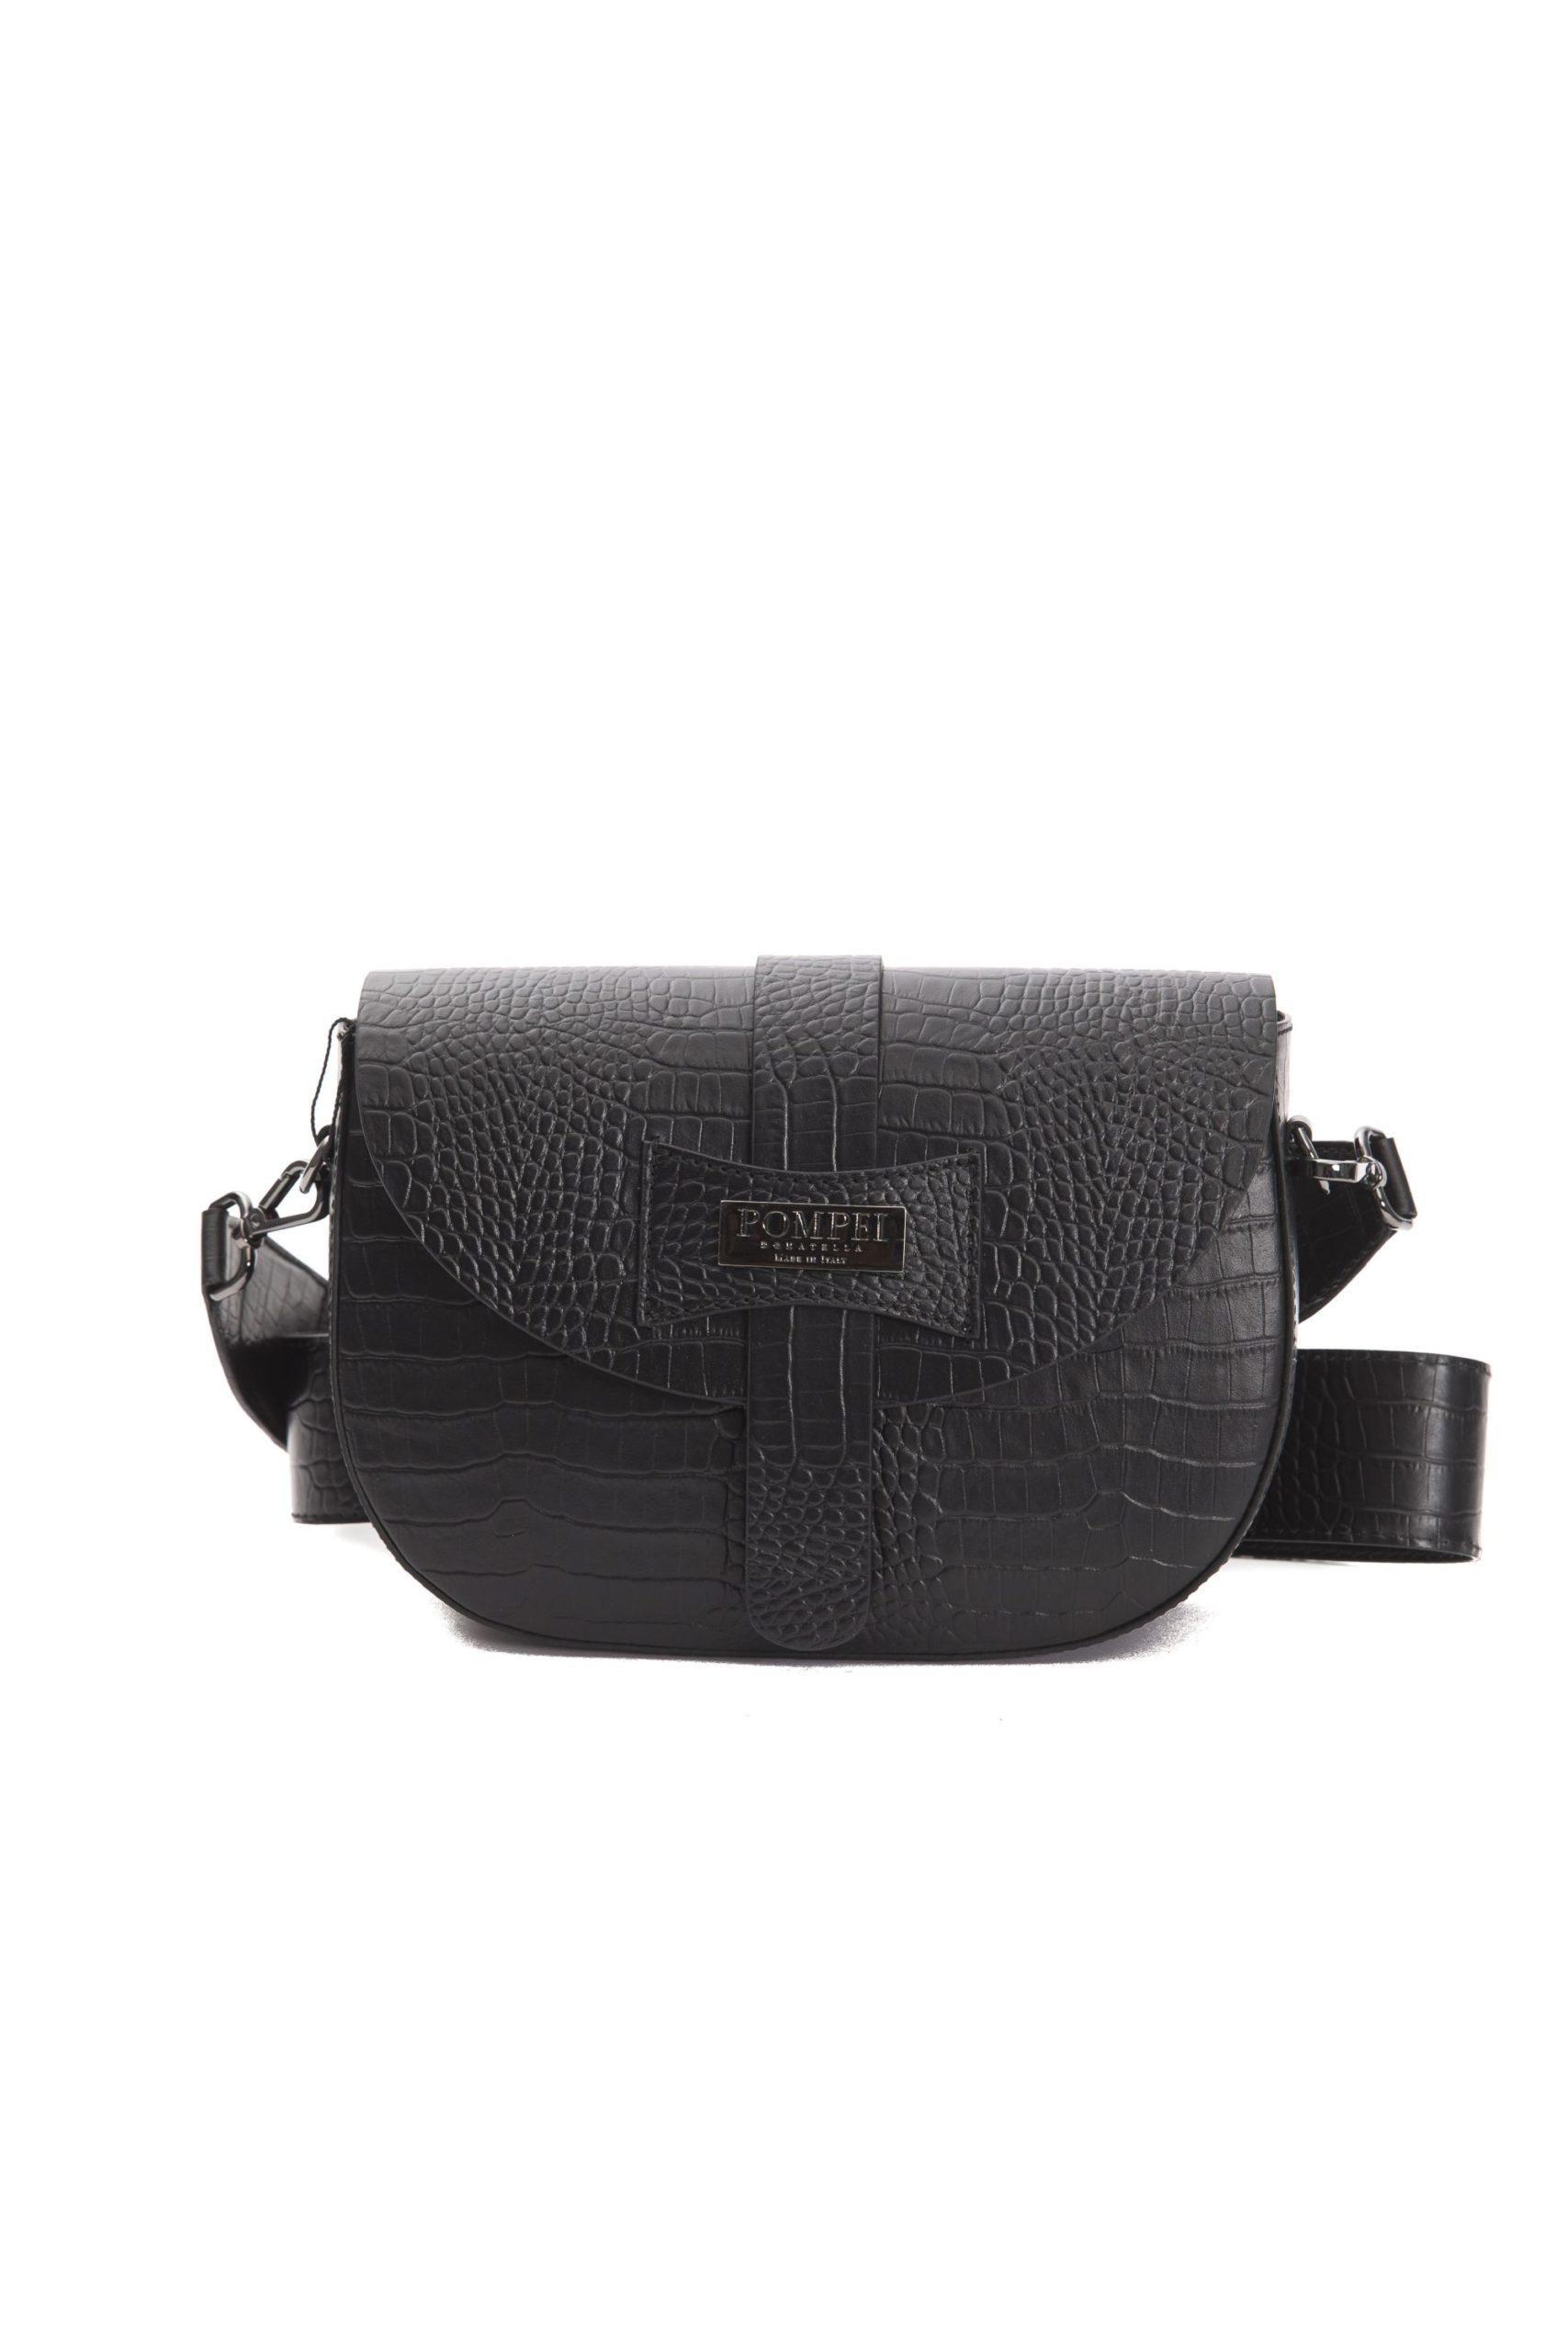 Pompei Donatella Women's Nero Crossbody Bag Black PO1004905